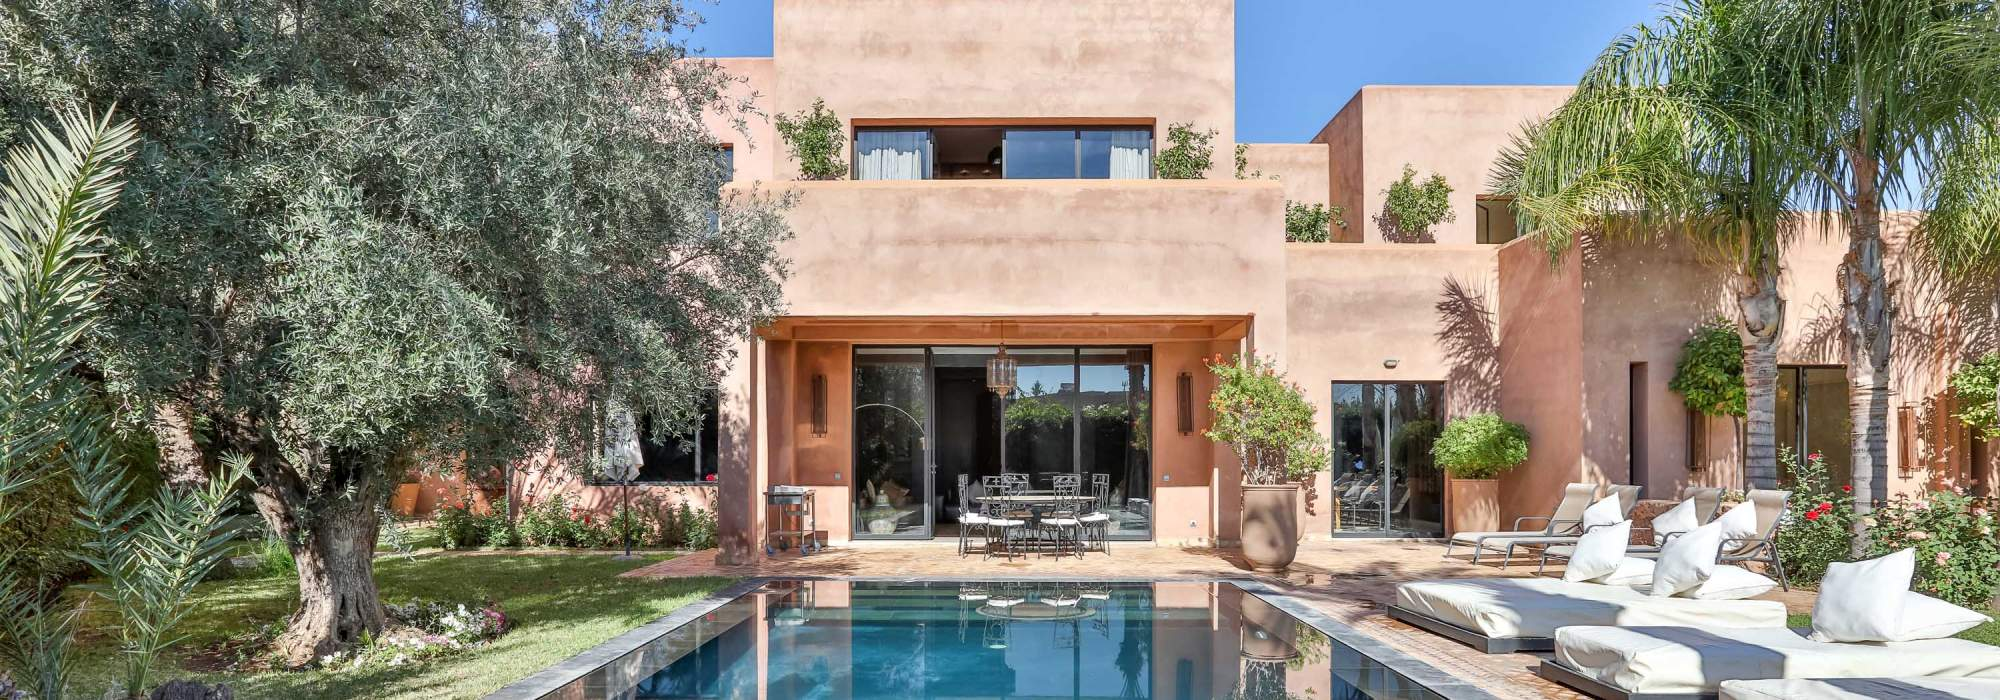 villa a vendre golf d'amelkis marrakech